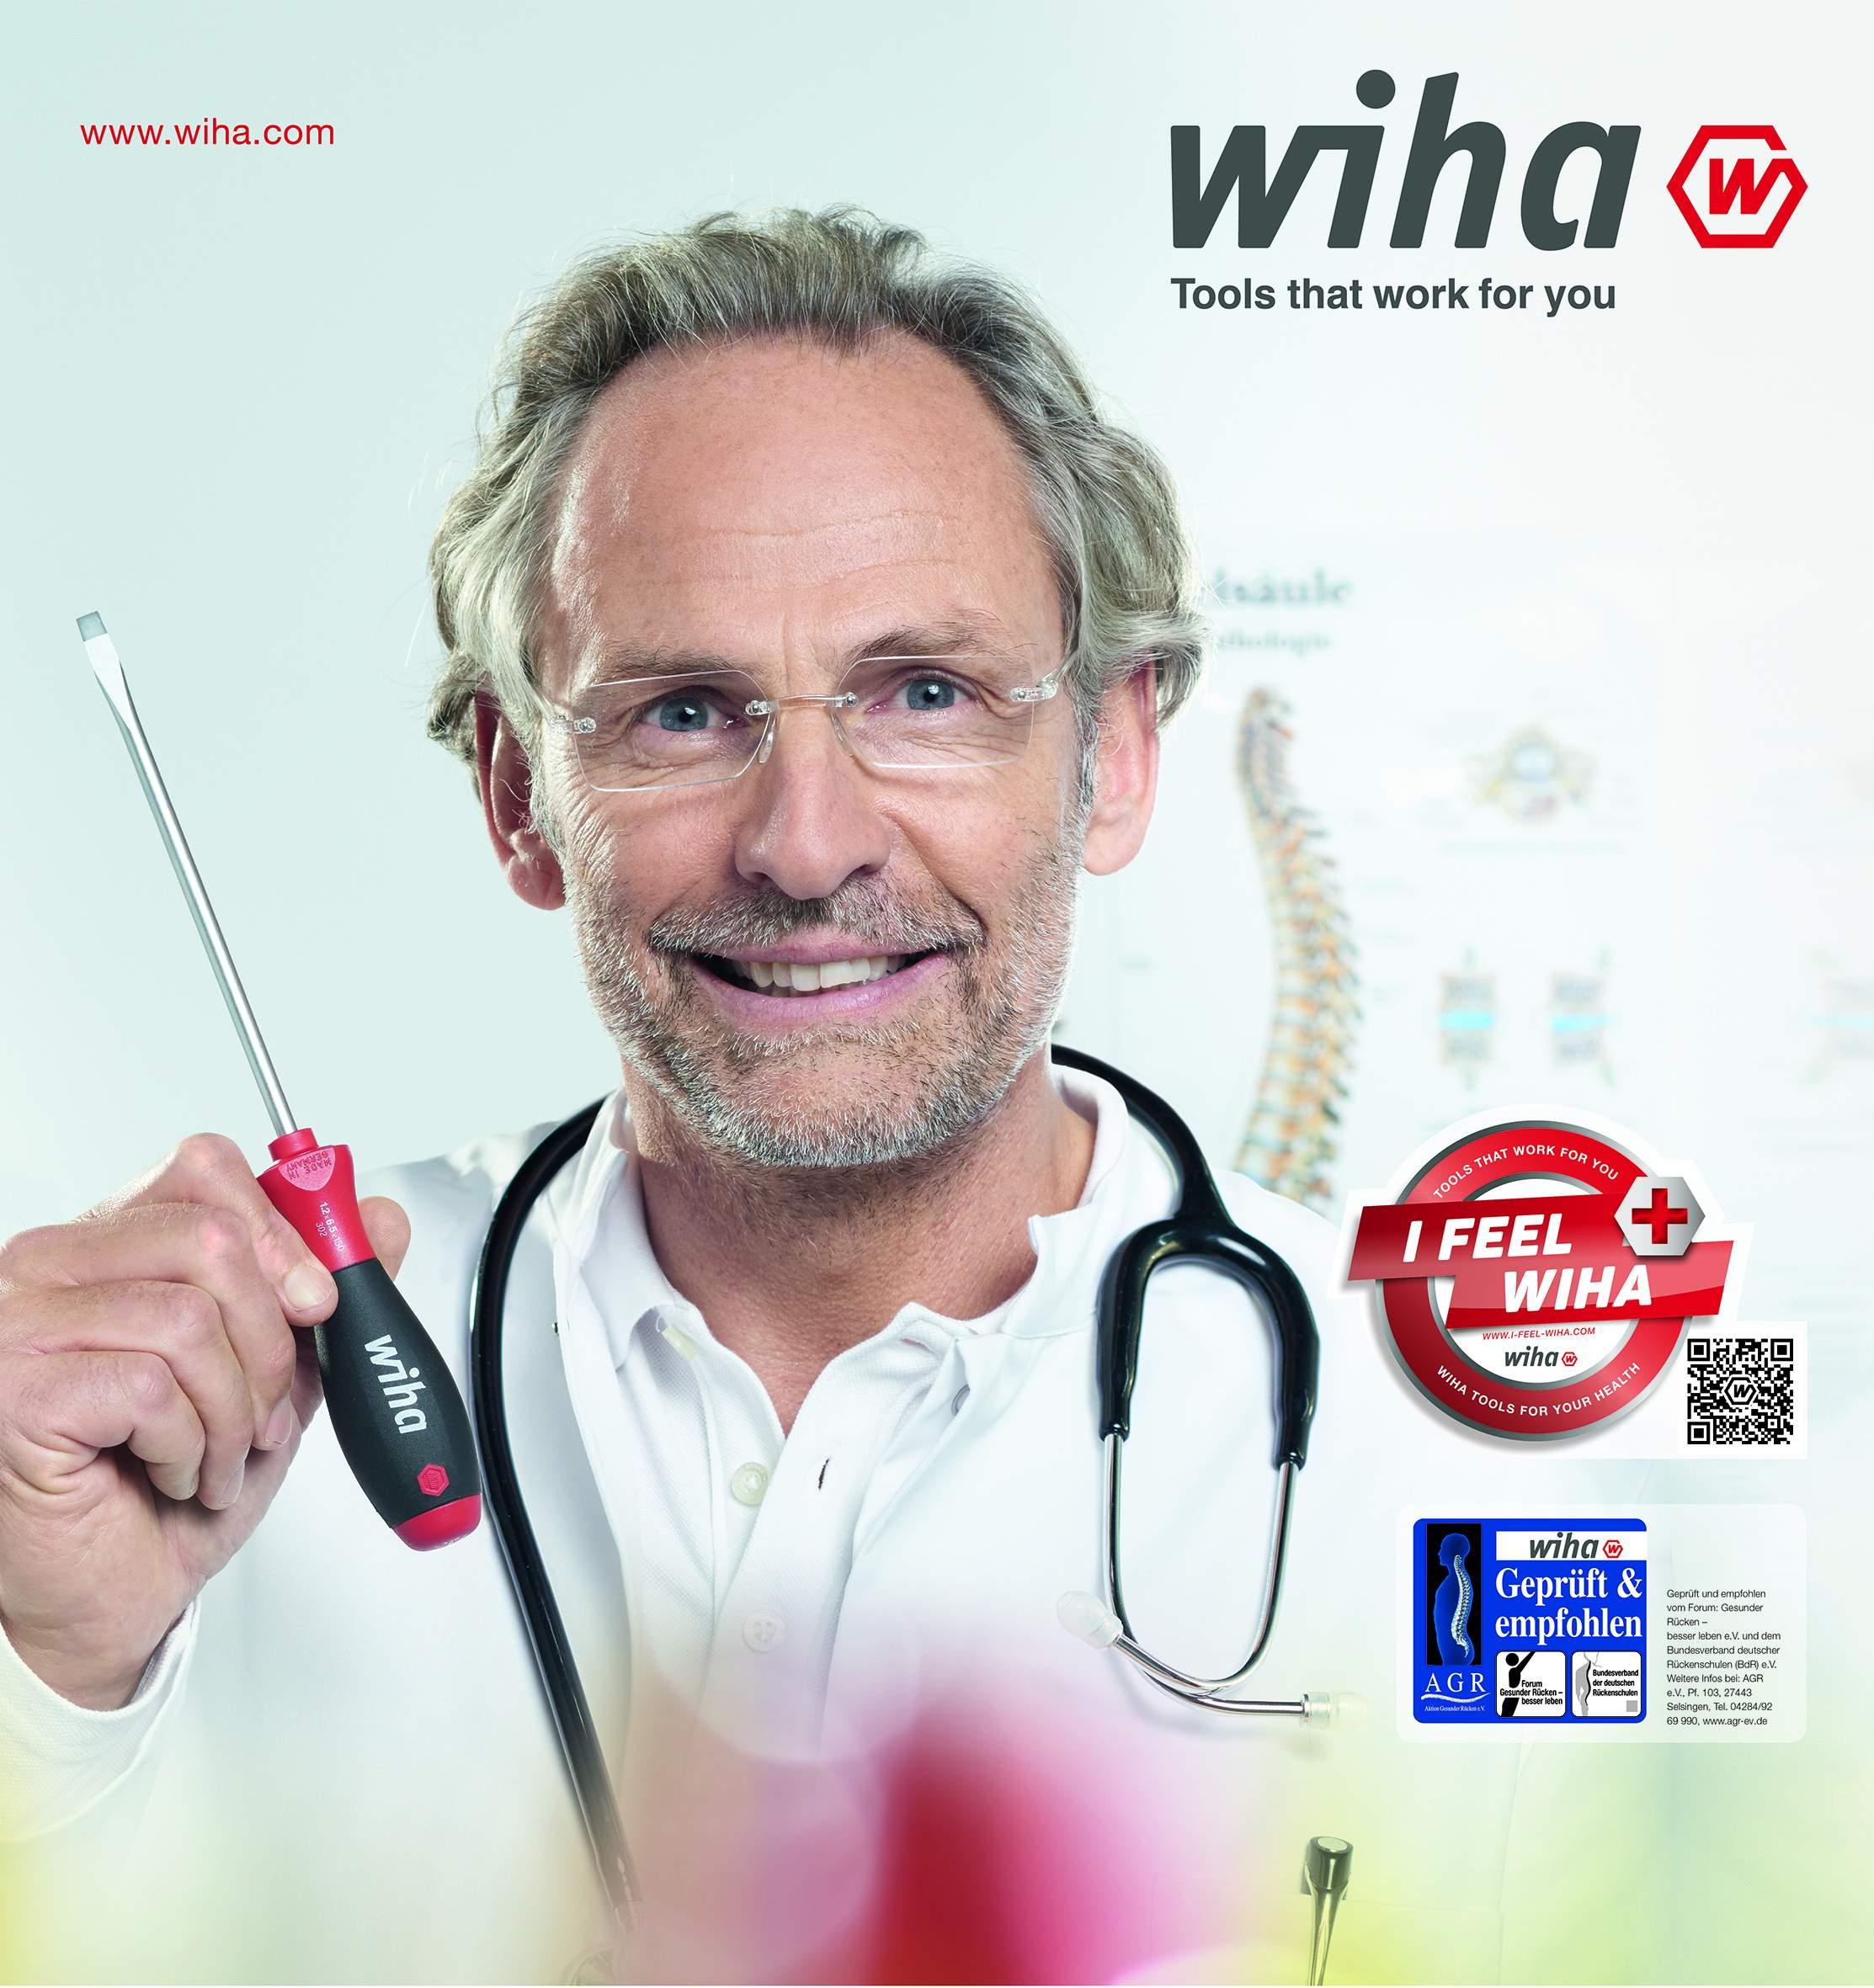 Wiha Gesundheitskampagne Anzeigenmotiv doc 300dpi